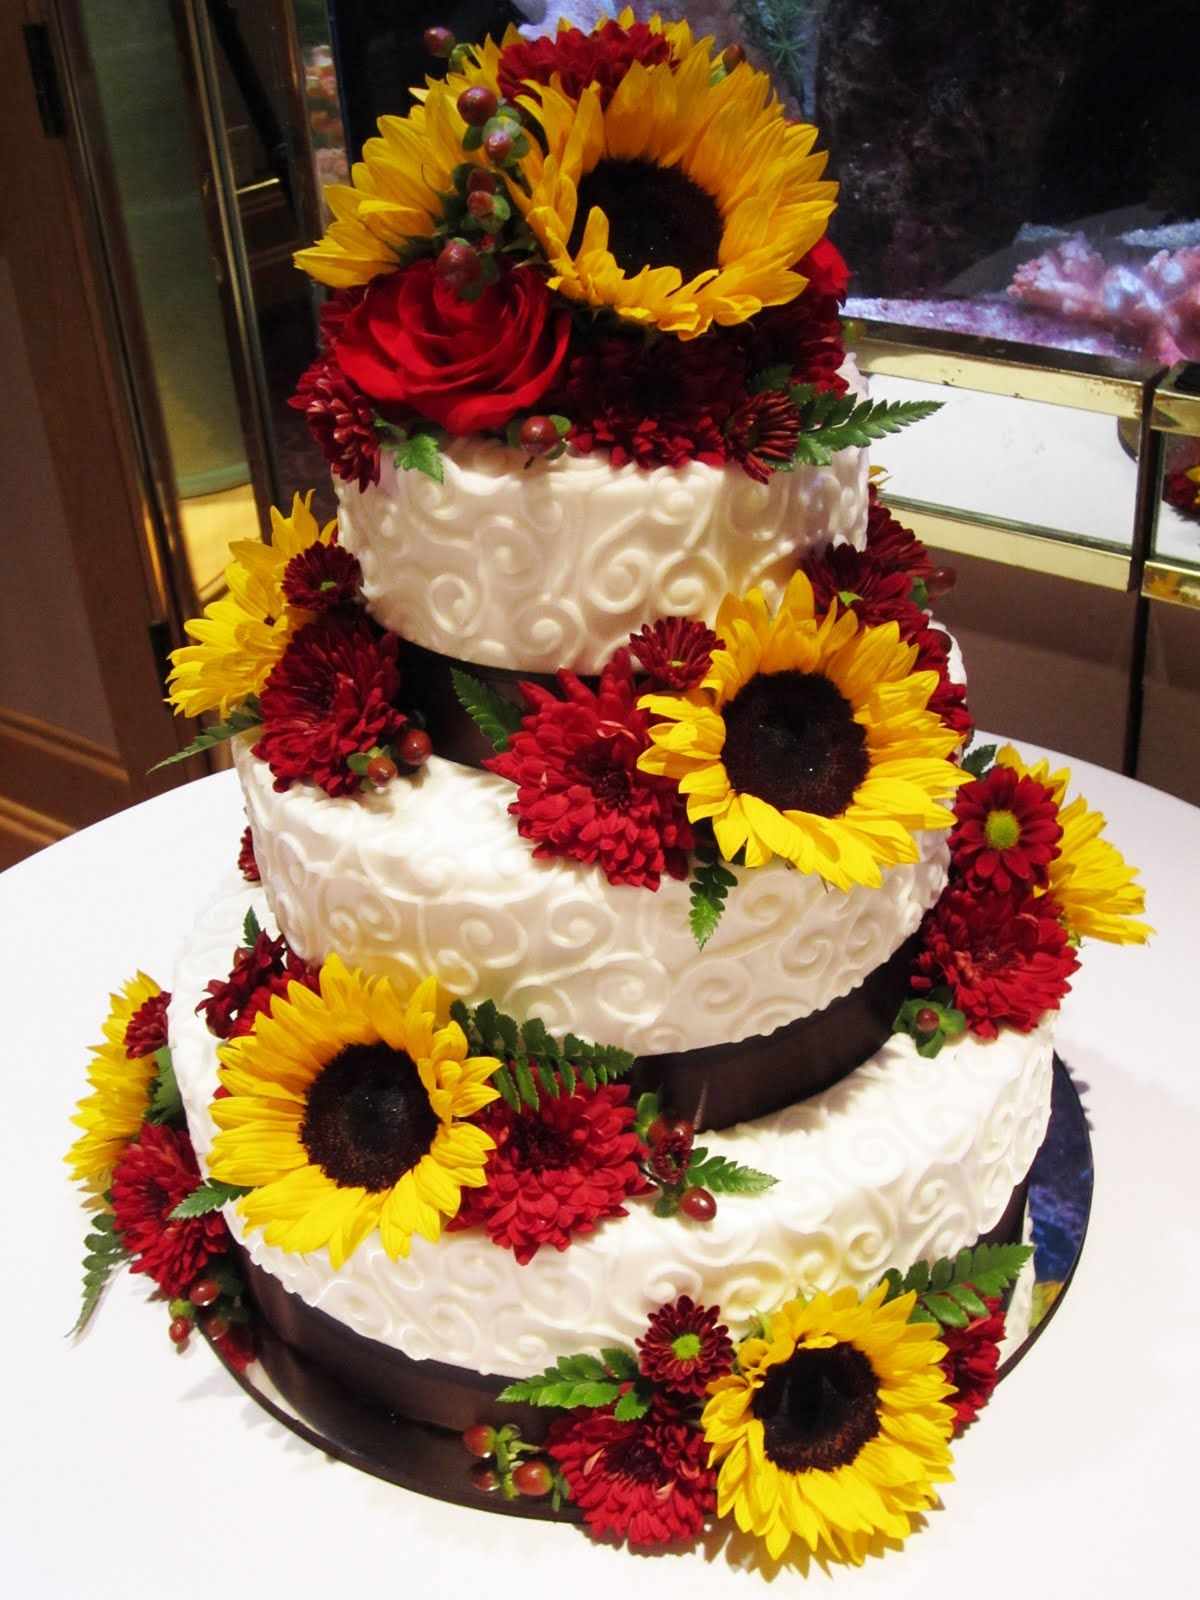 Diy camo wedding decorations  sunflowers wheat and camo wedding  Cakes by Sarah  wedding